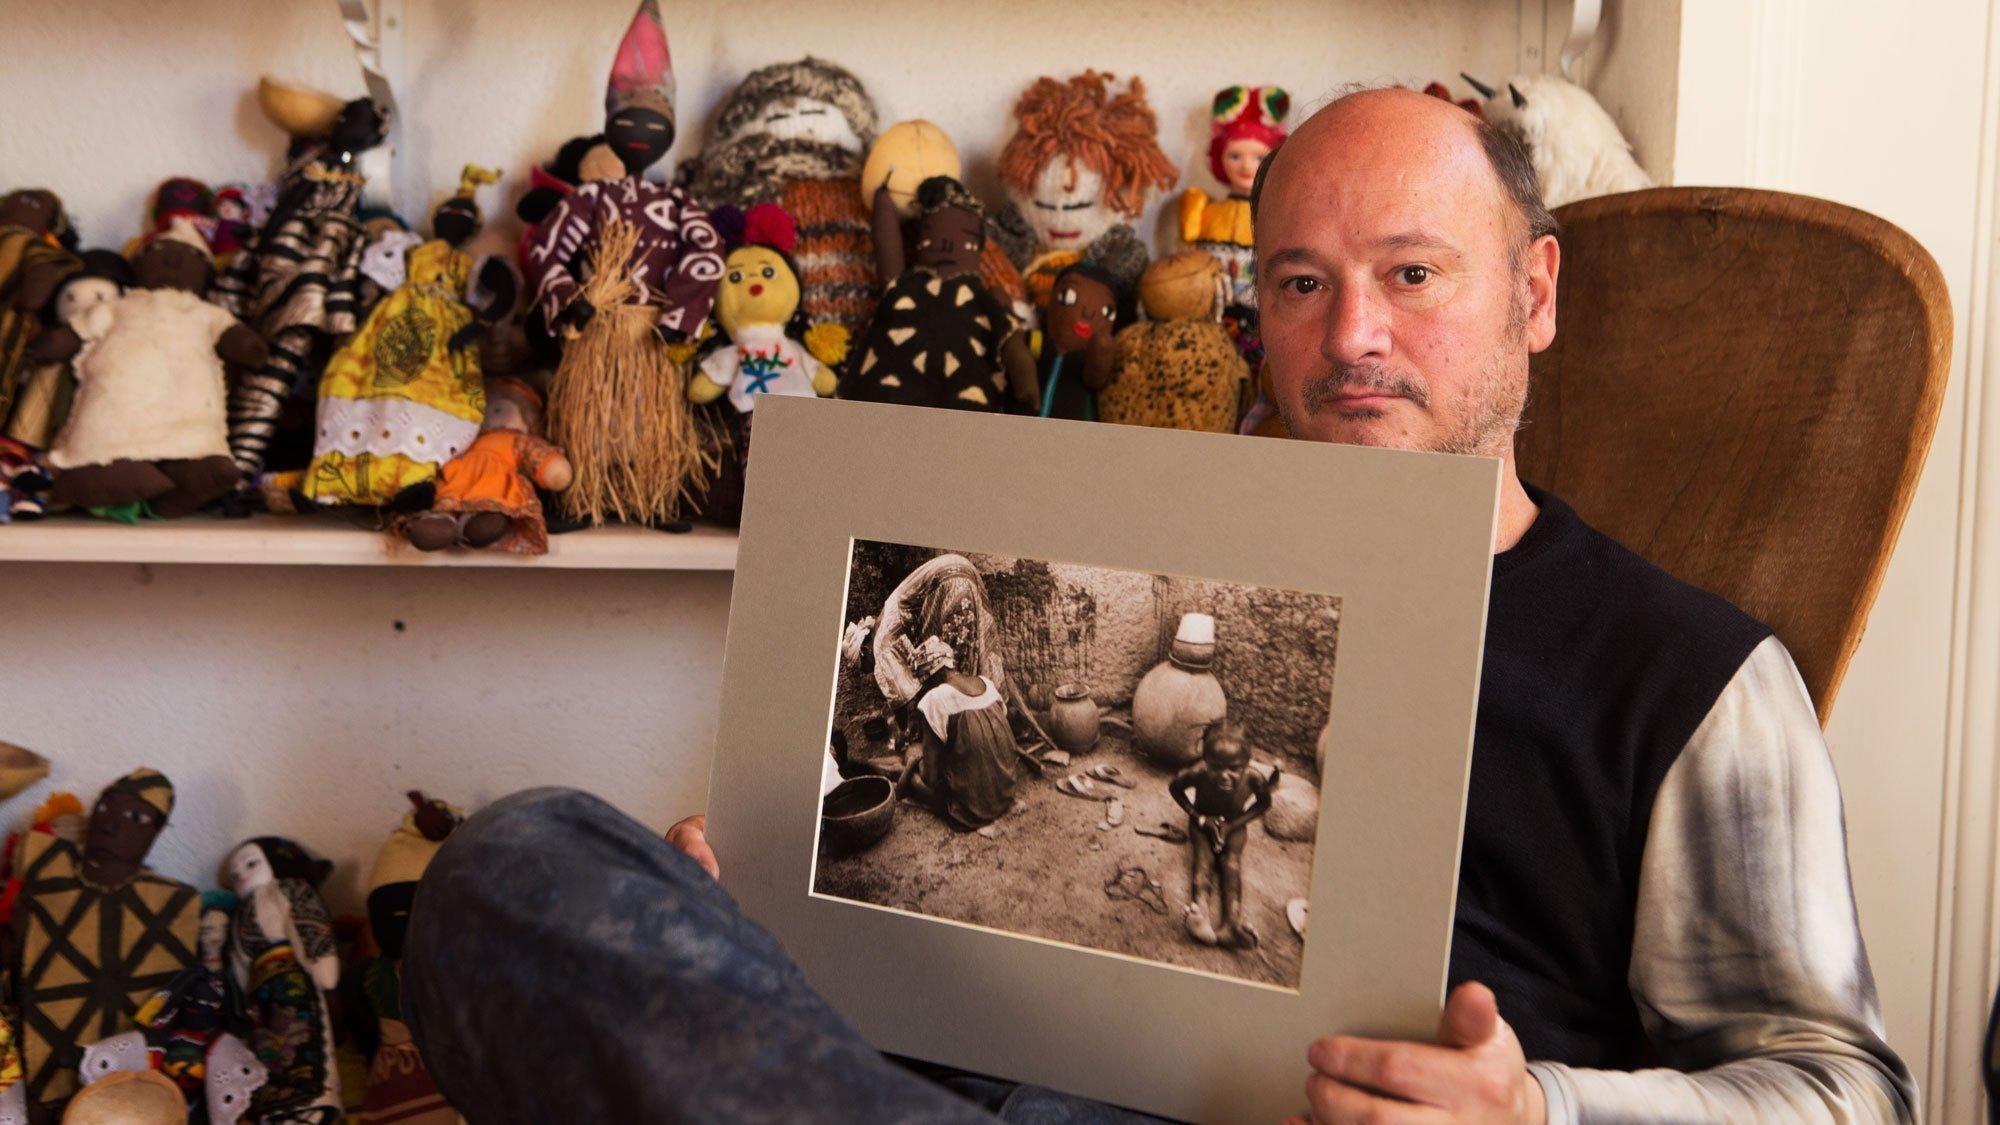 Fotograf Kim Manresa mit seiner Foto-Ikone über Female Genital Mutilation